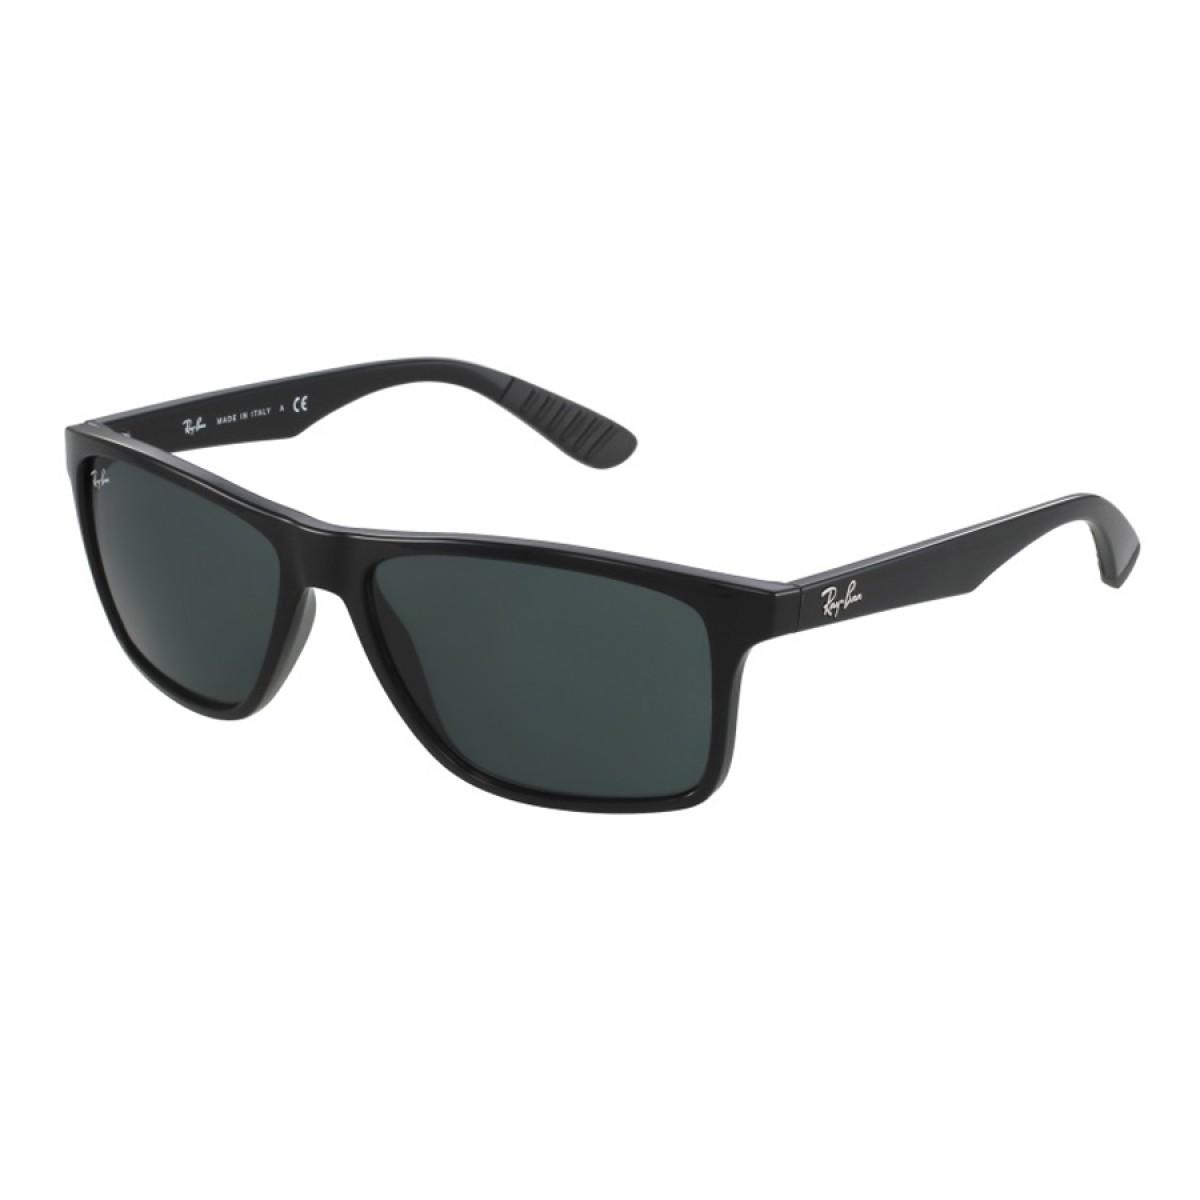 19dac034807 Ray Ban Square Acetate Polarized Men Sunglasses RB4234-601 71 - Sunglasses  - Fashion World